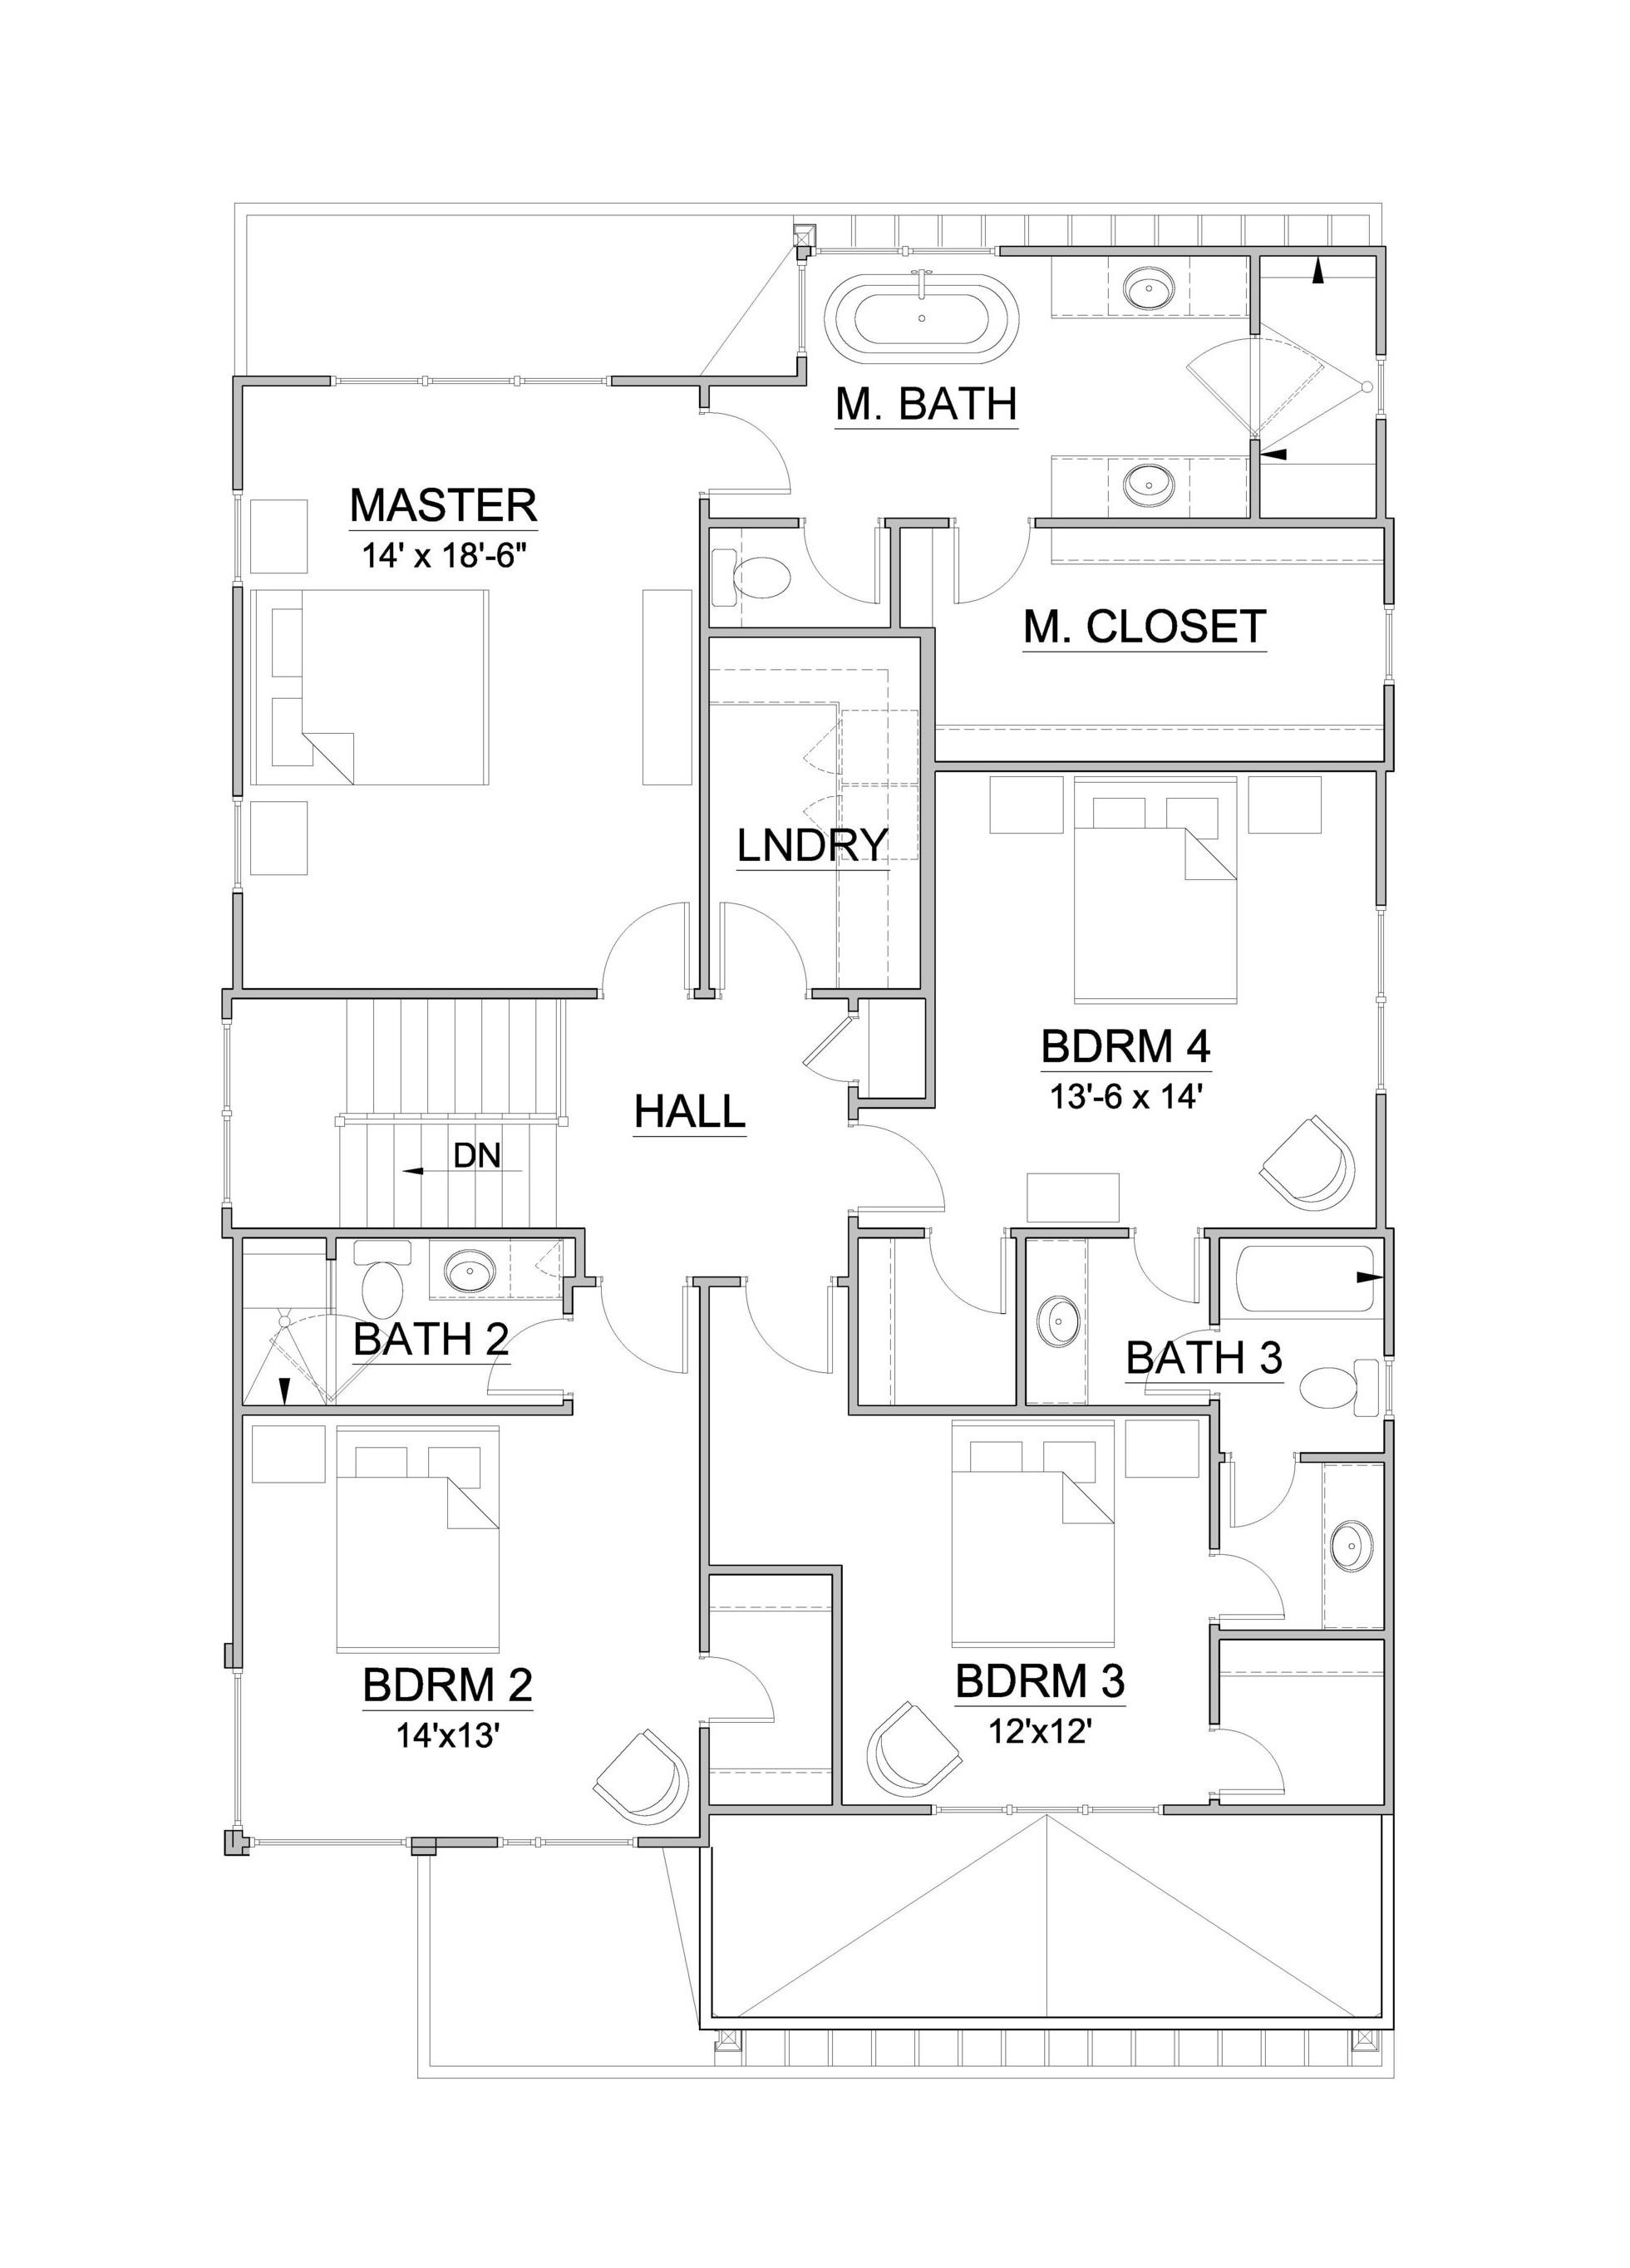 Lomax_Second Floor_24x36.jpg